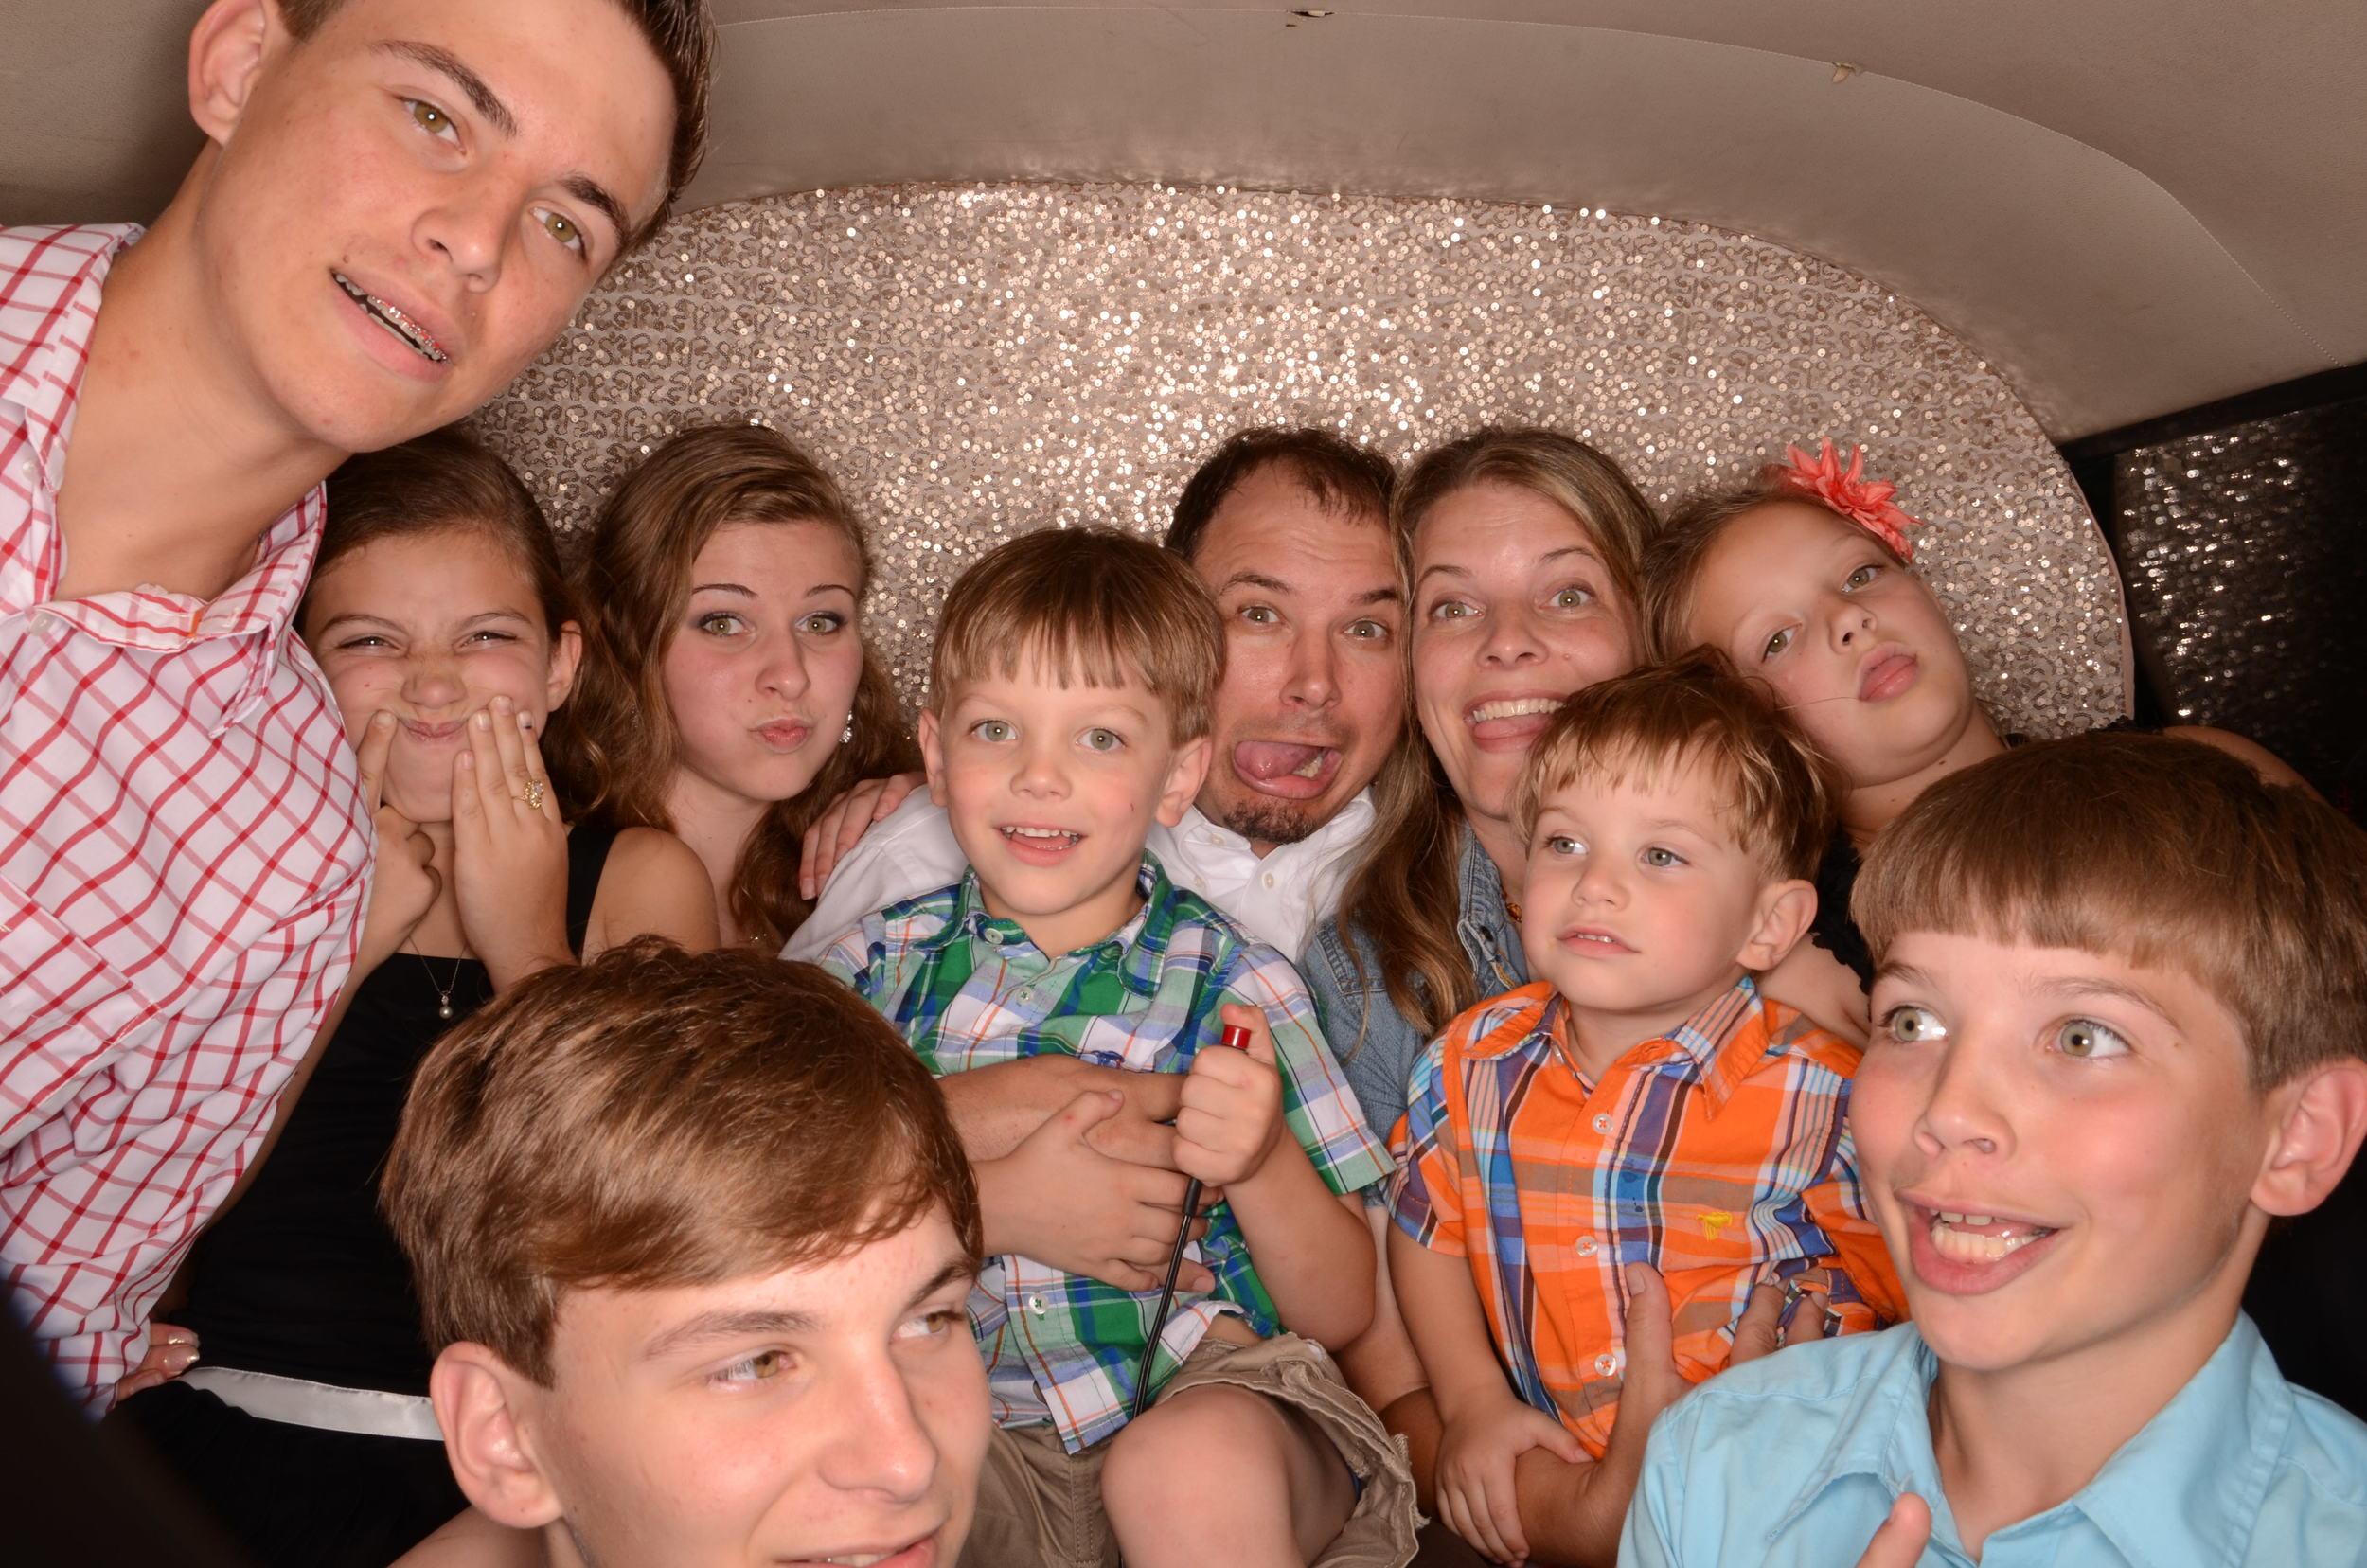 fun-photobooth-the-photo-bus